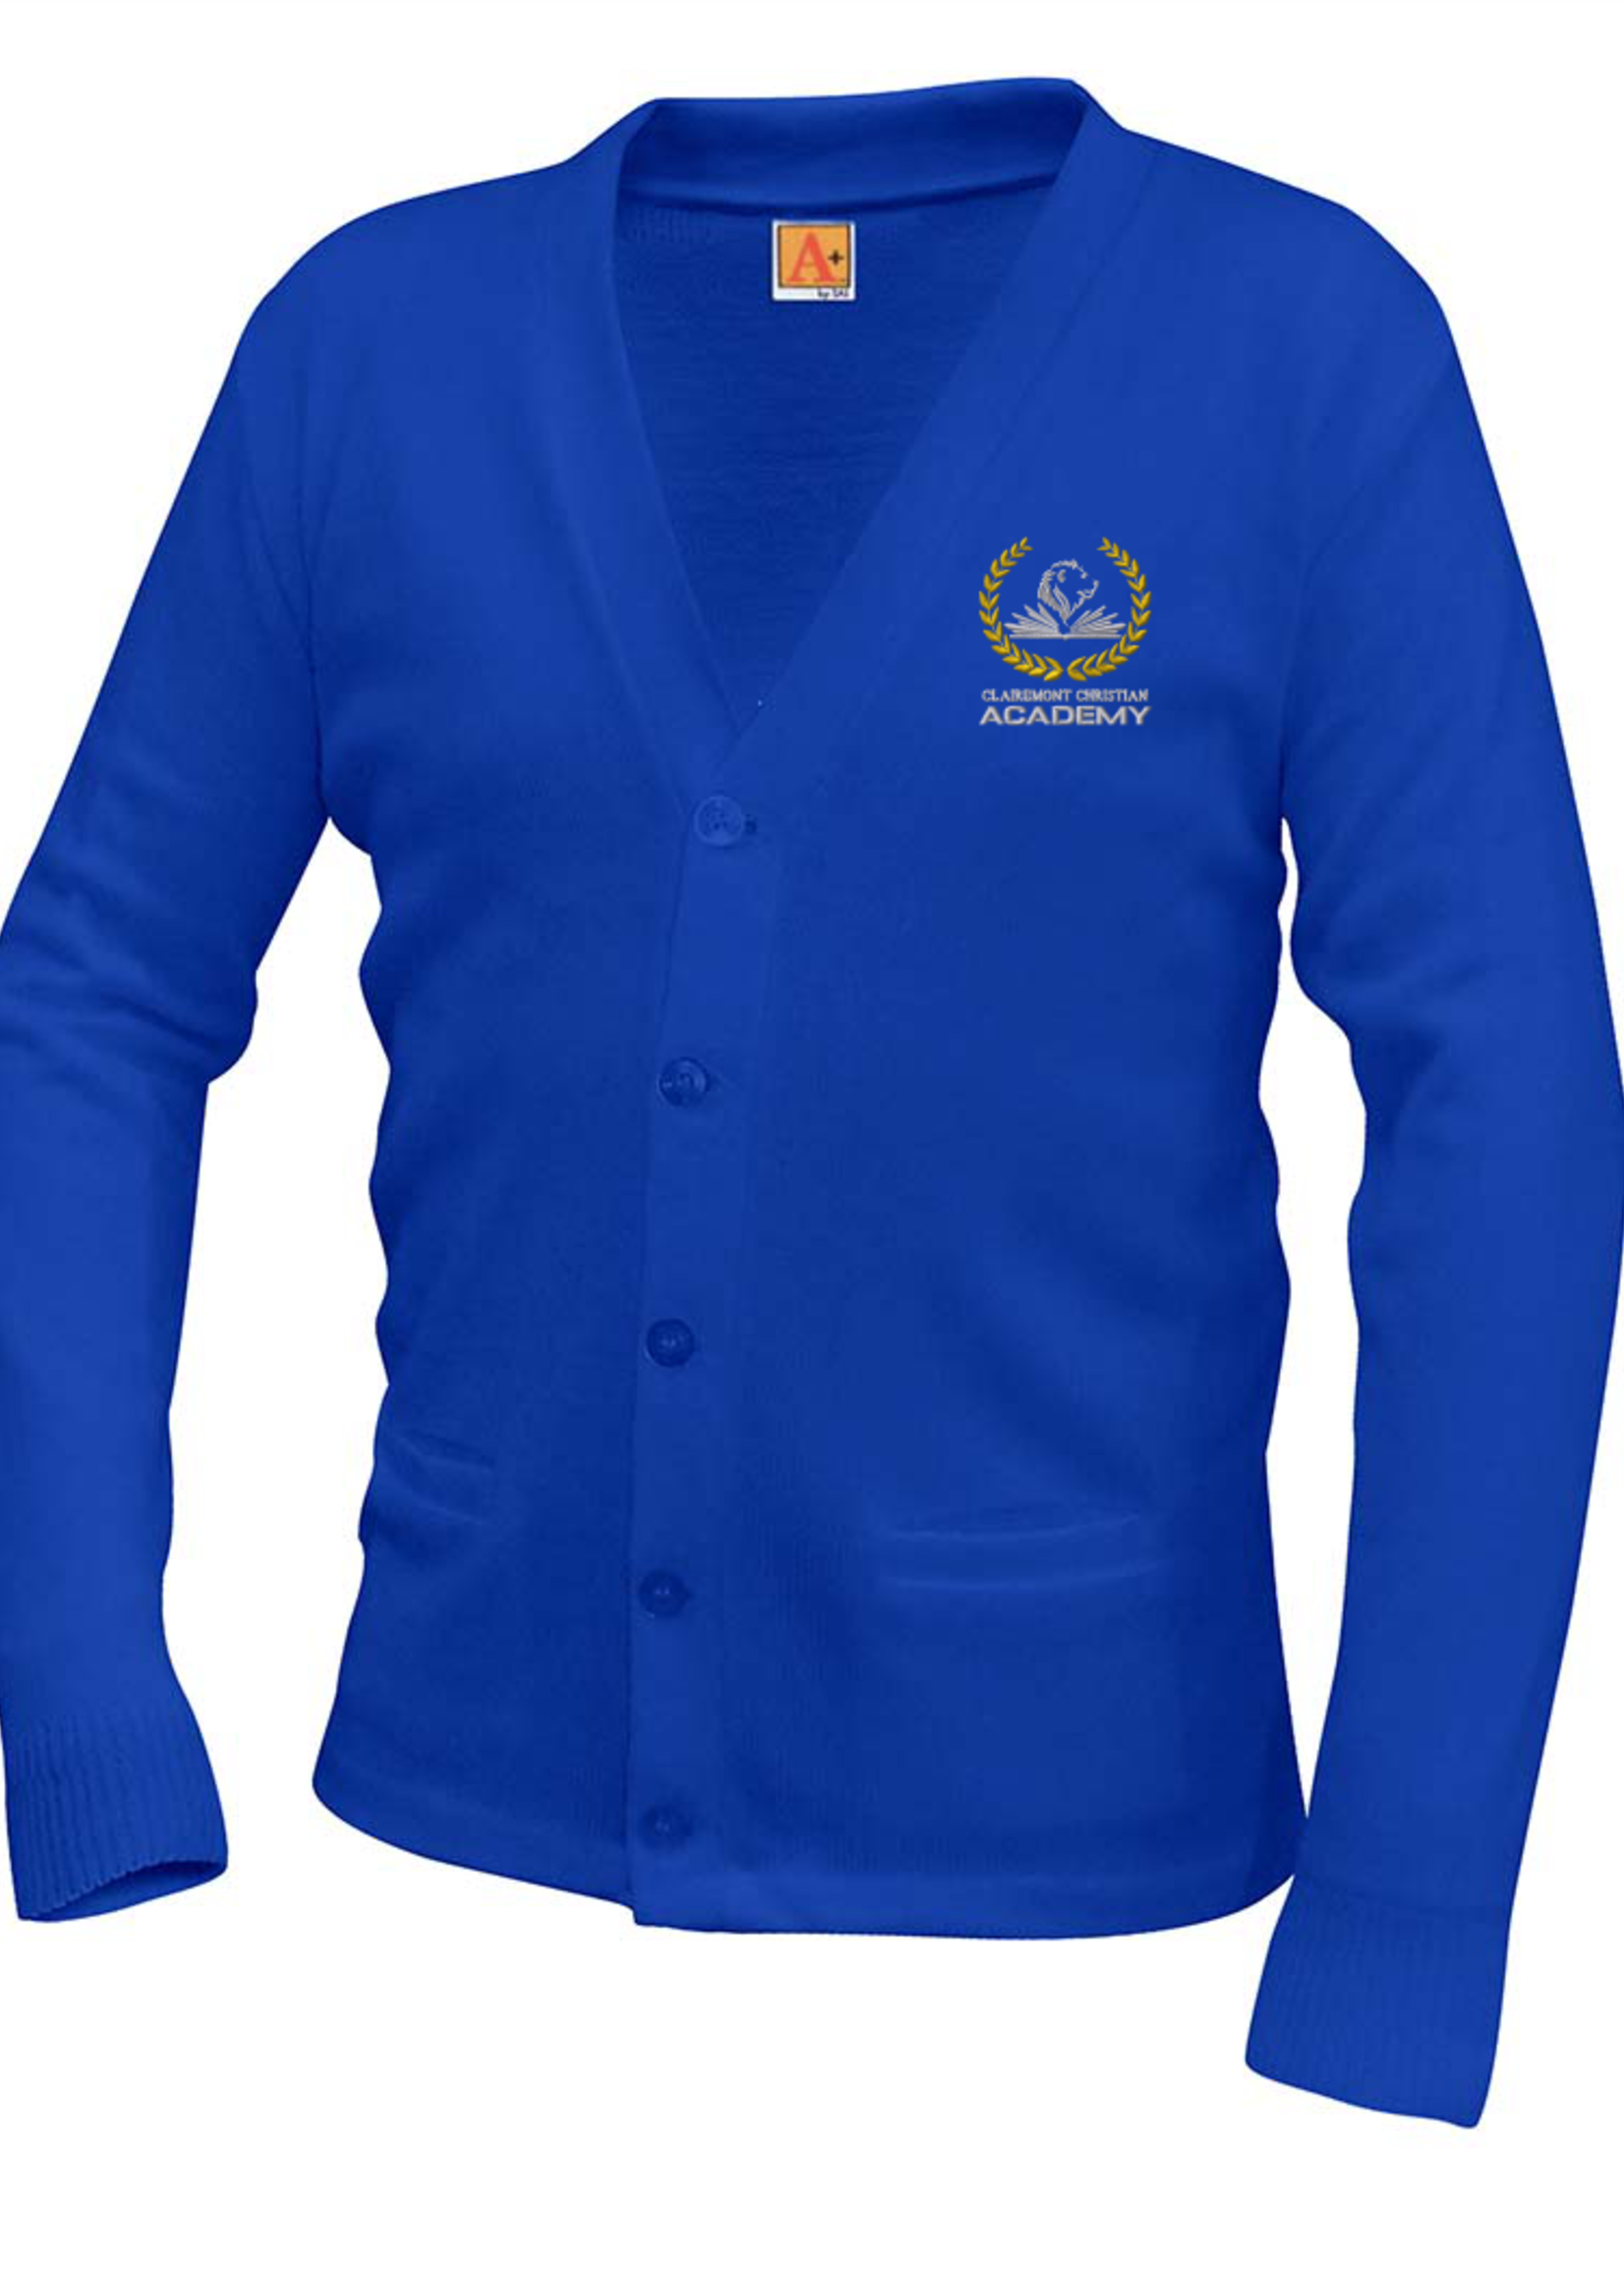 TUS CLCA Royal Cardigan V-neck with pocket